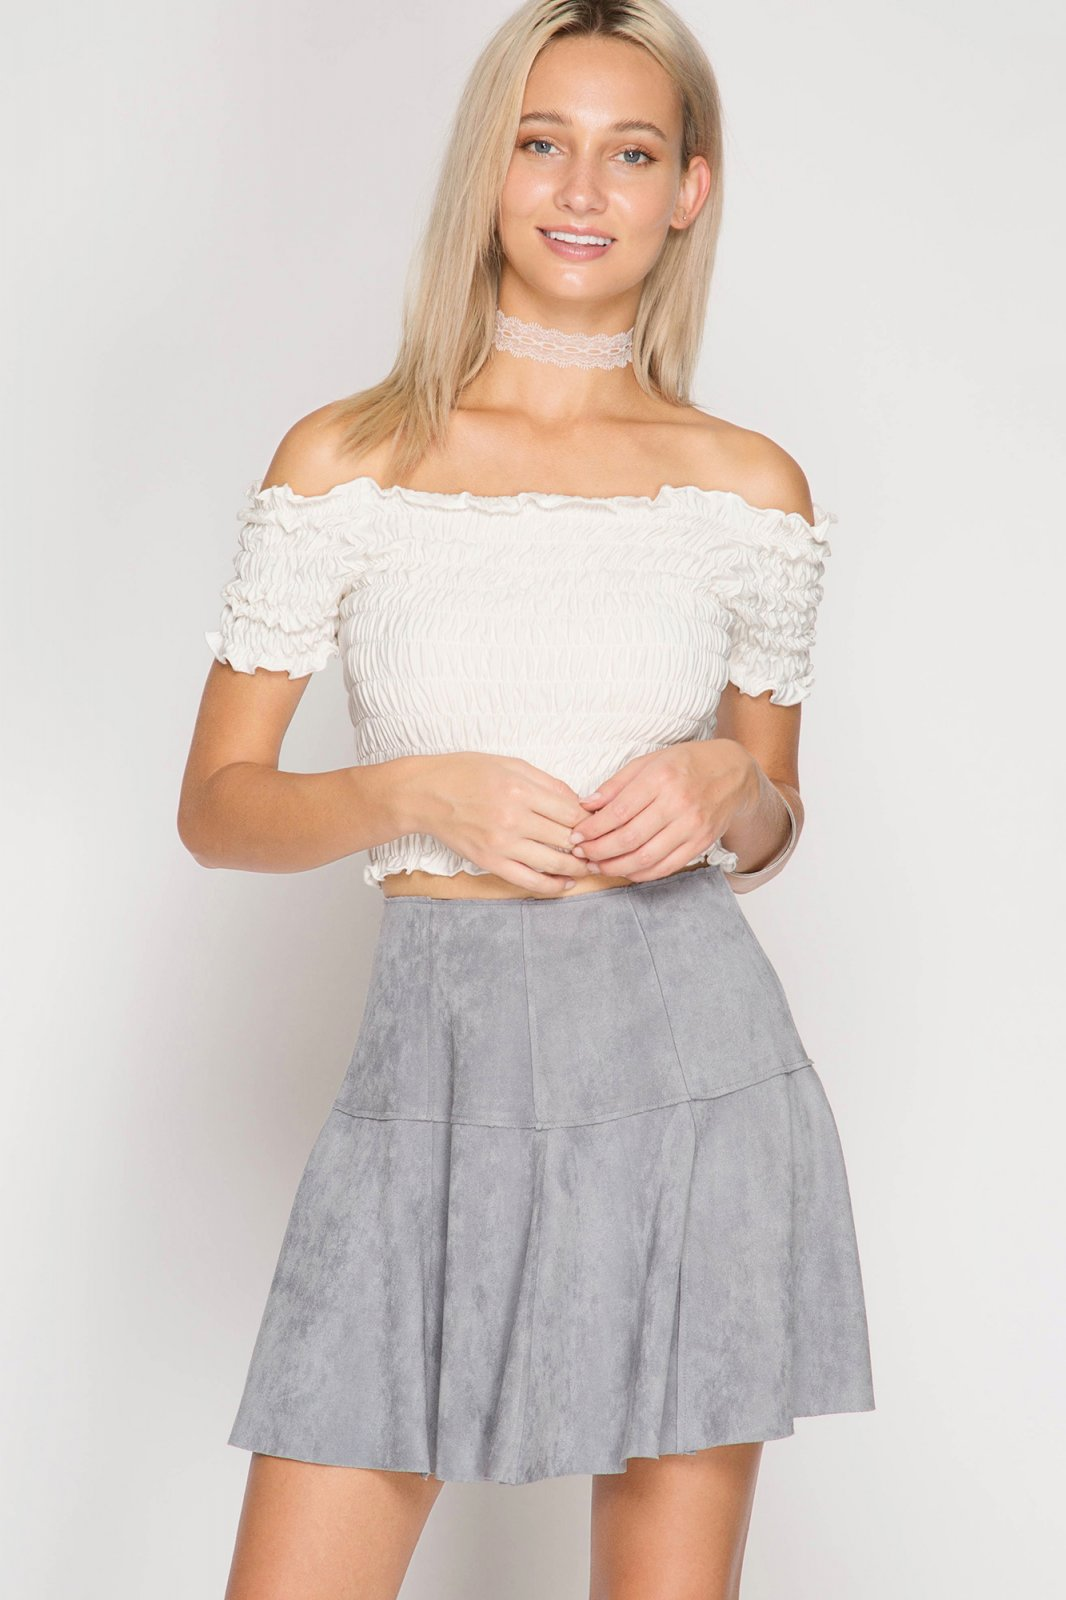 FAUX LEATHER Flare Mini Skirt LIGHT SLATE * JR / Ms / Adult PT